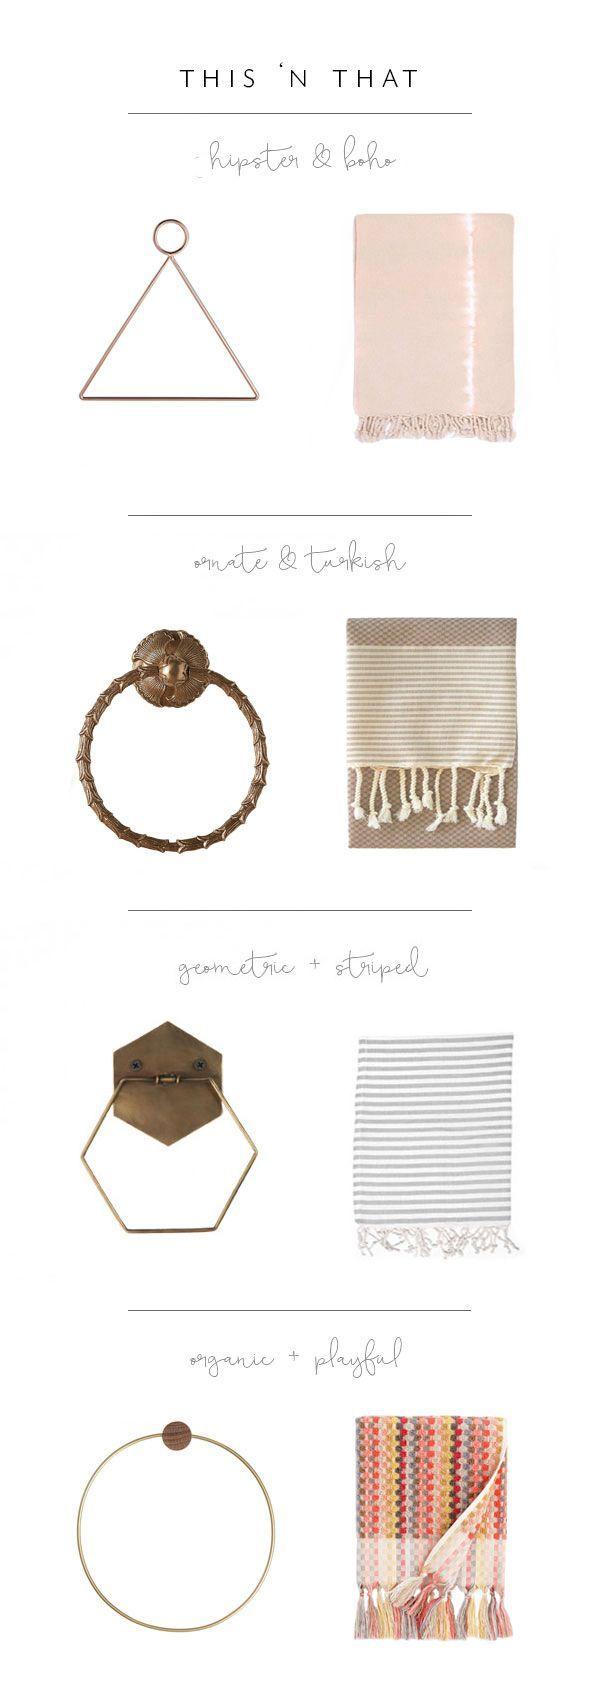 hand towel and towel ring pairings - boho eclectic | via coco kelley